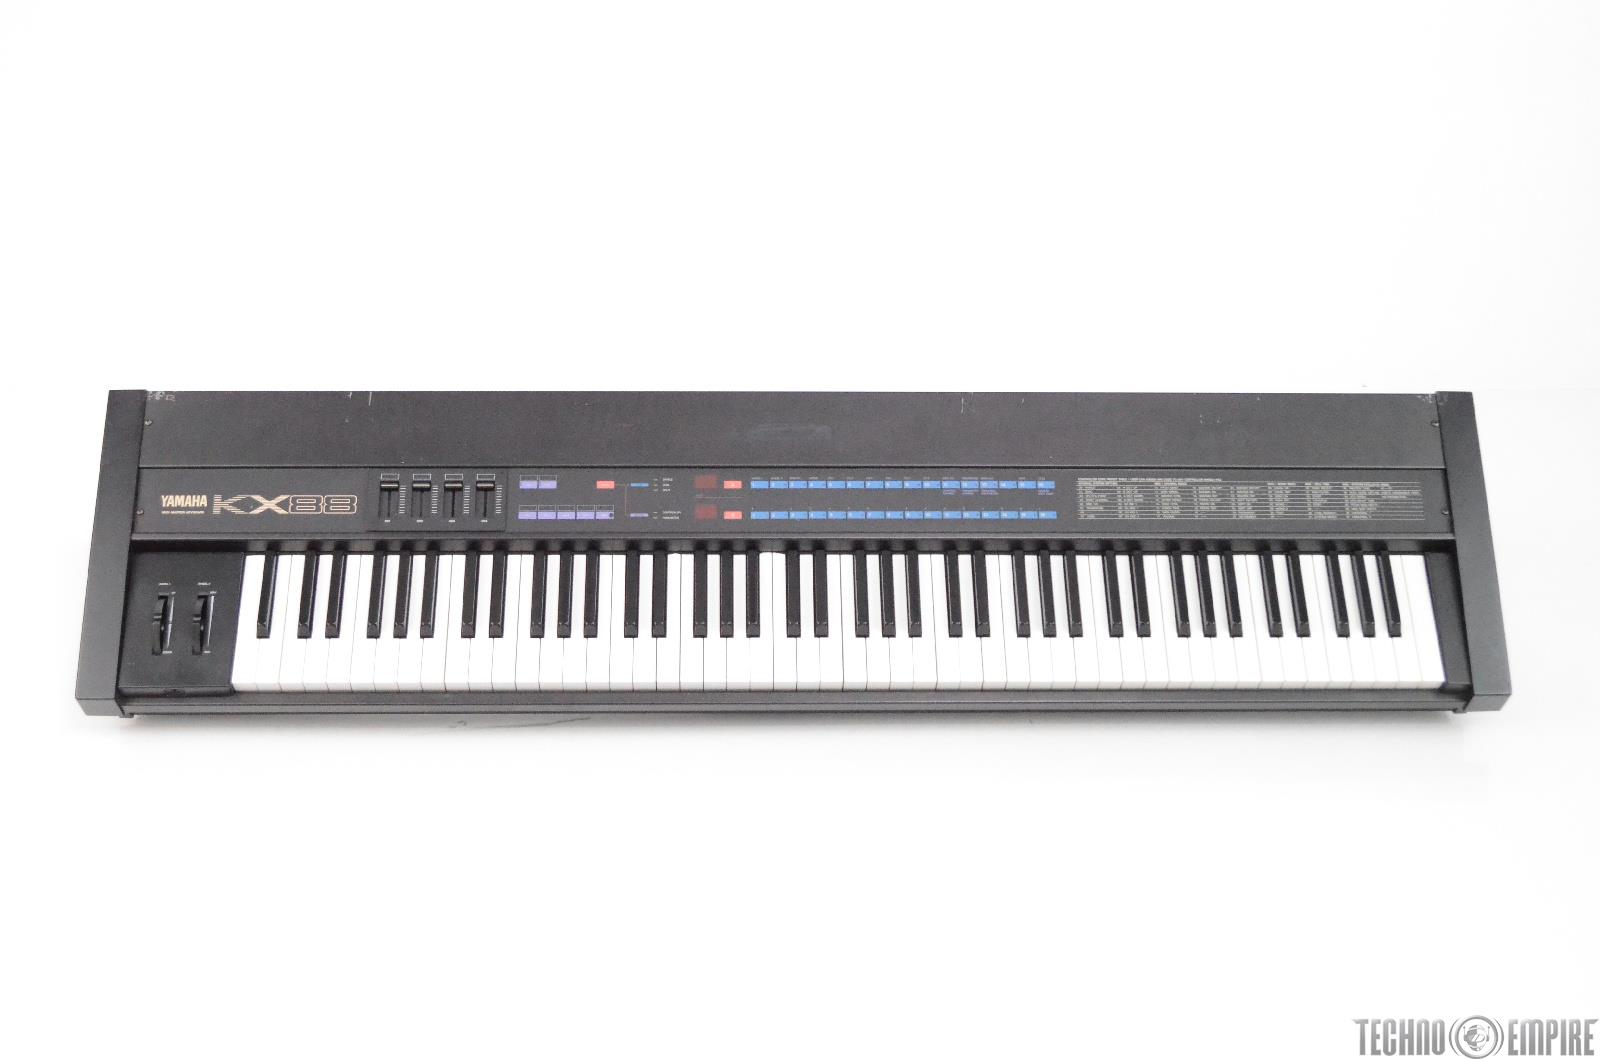 Yamaha KX88 MIDI Master 88 Key Weighted Keyboard Controller w/ Case KX 88 #31235